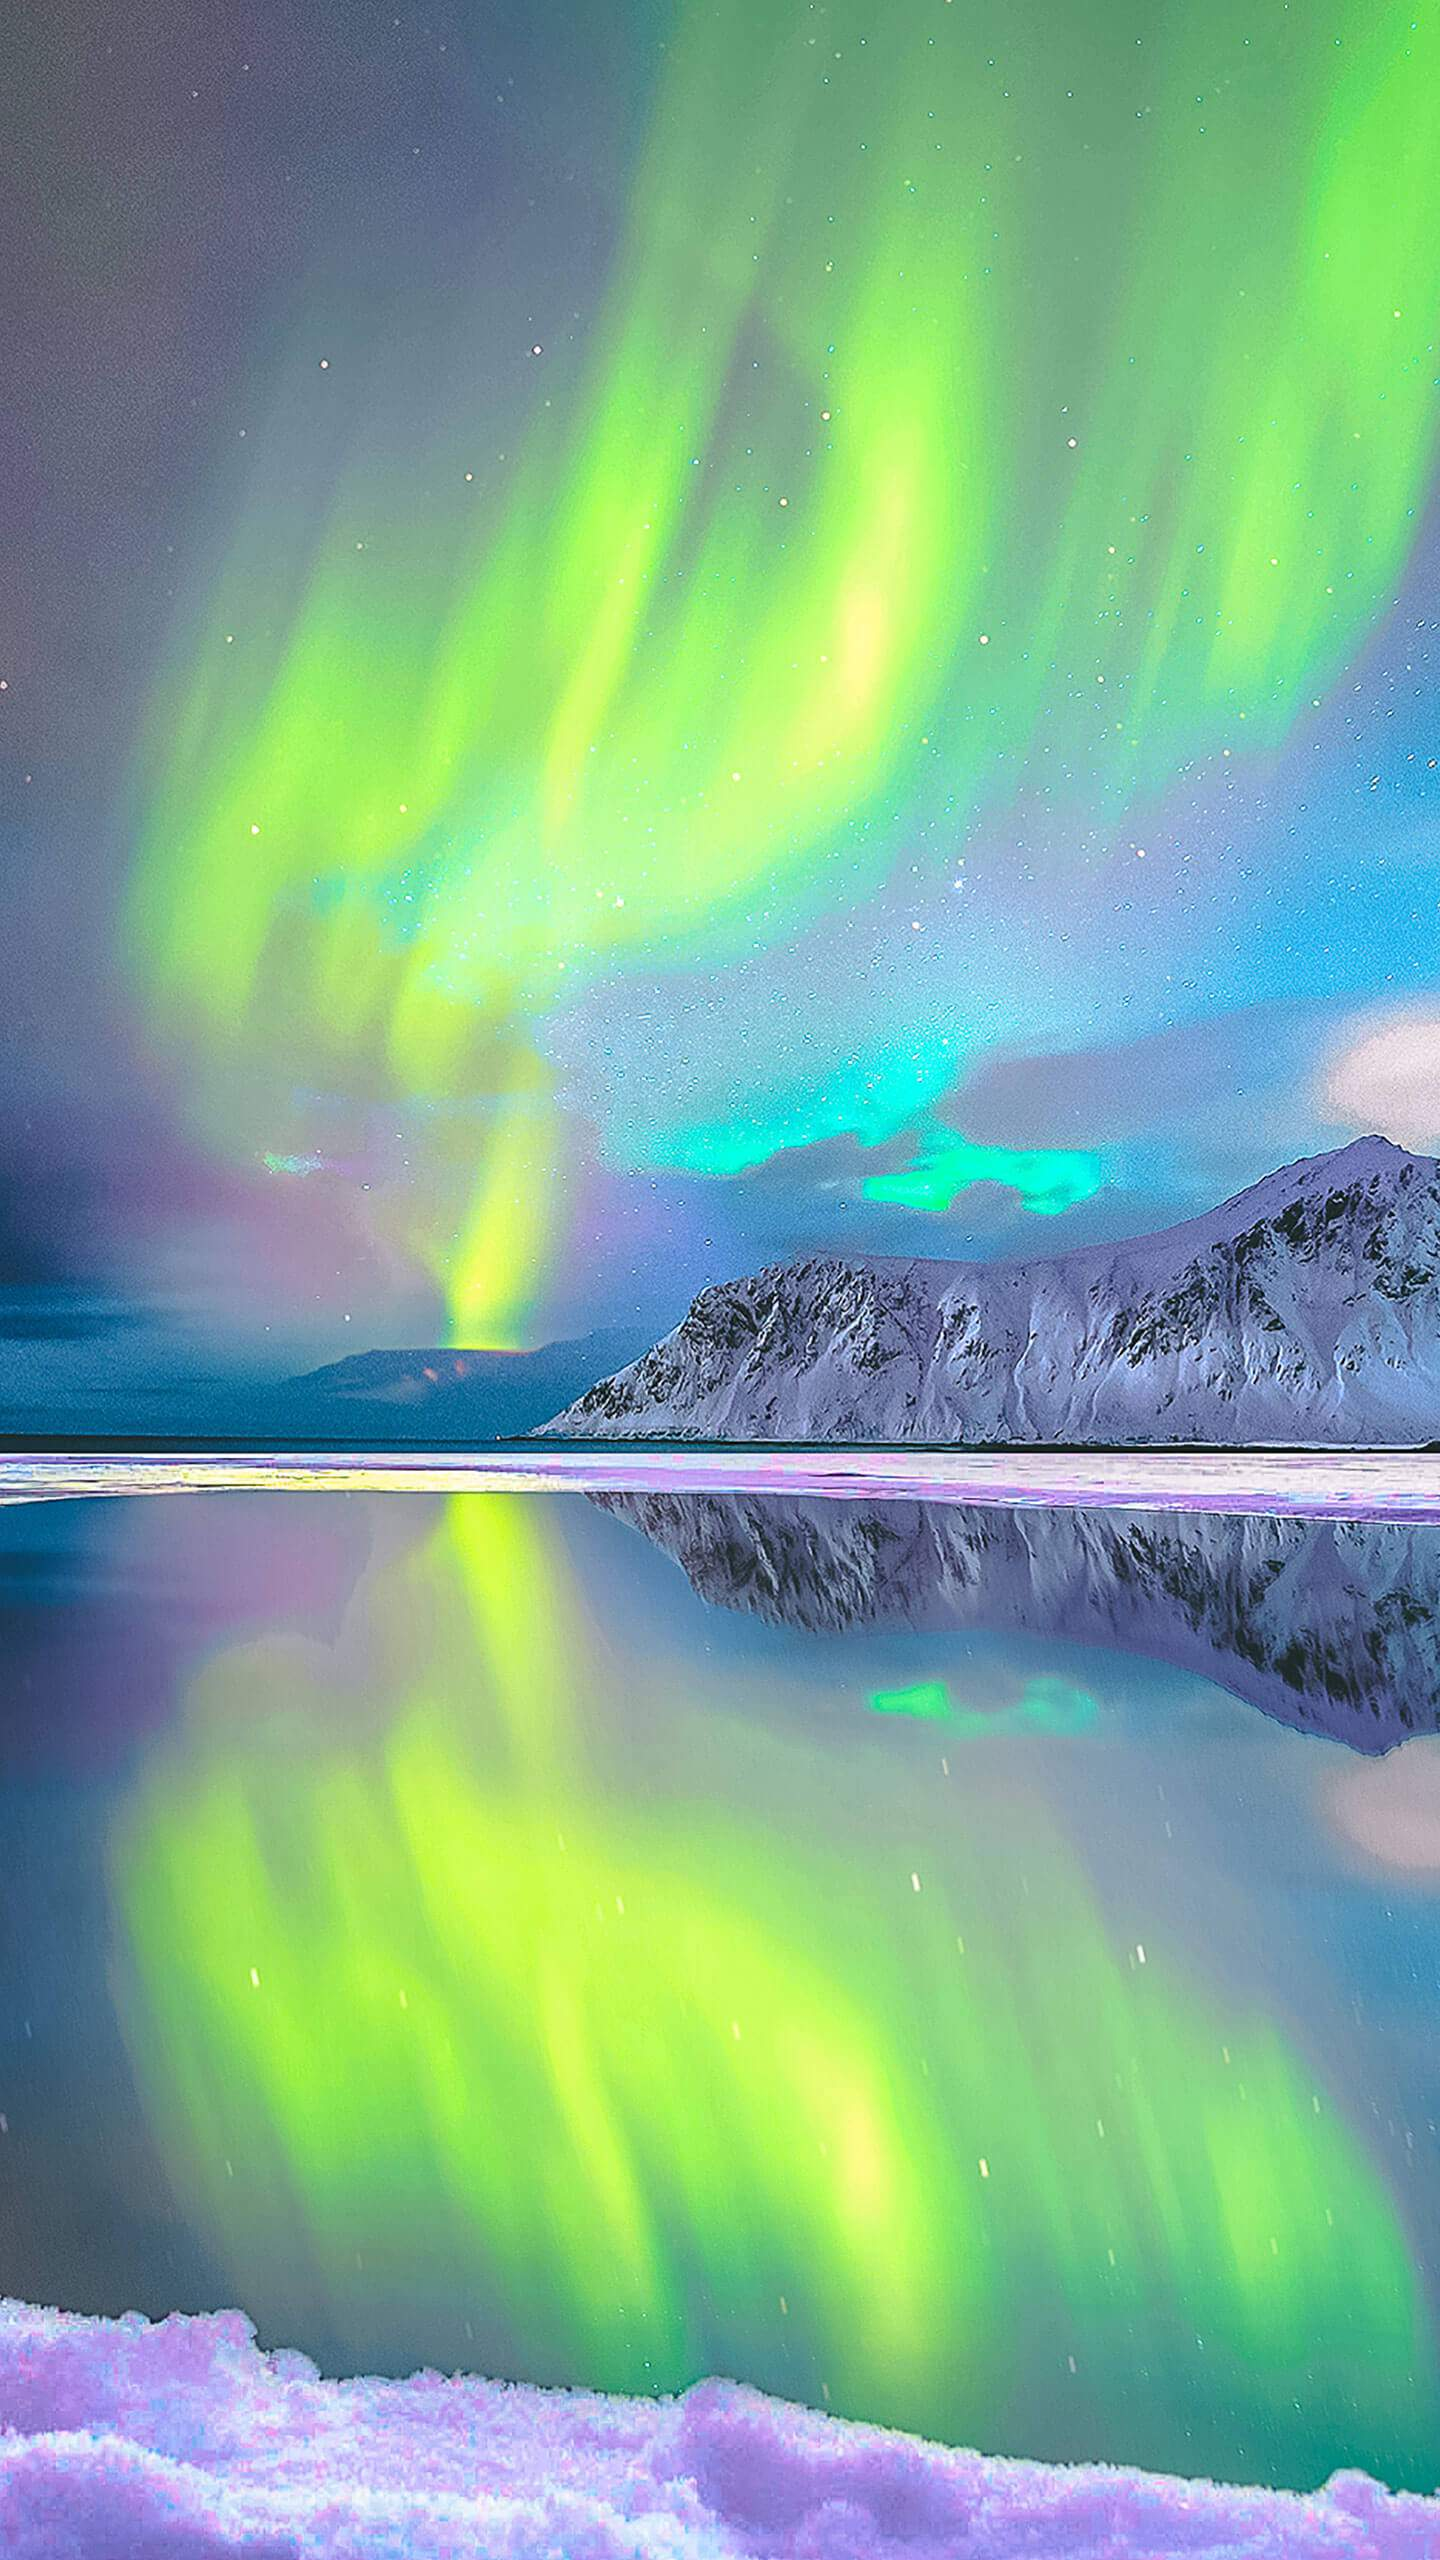 Fall Halloween Iphone Wallpaper Aurora Borealis Norway Iphone Wallpaper Iphone Wallpapers